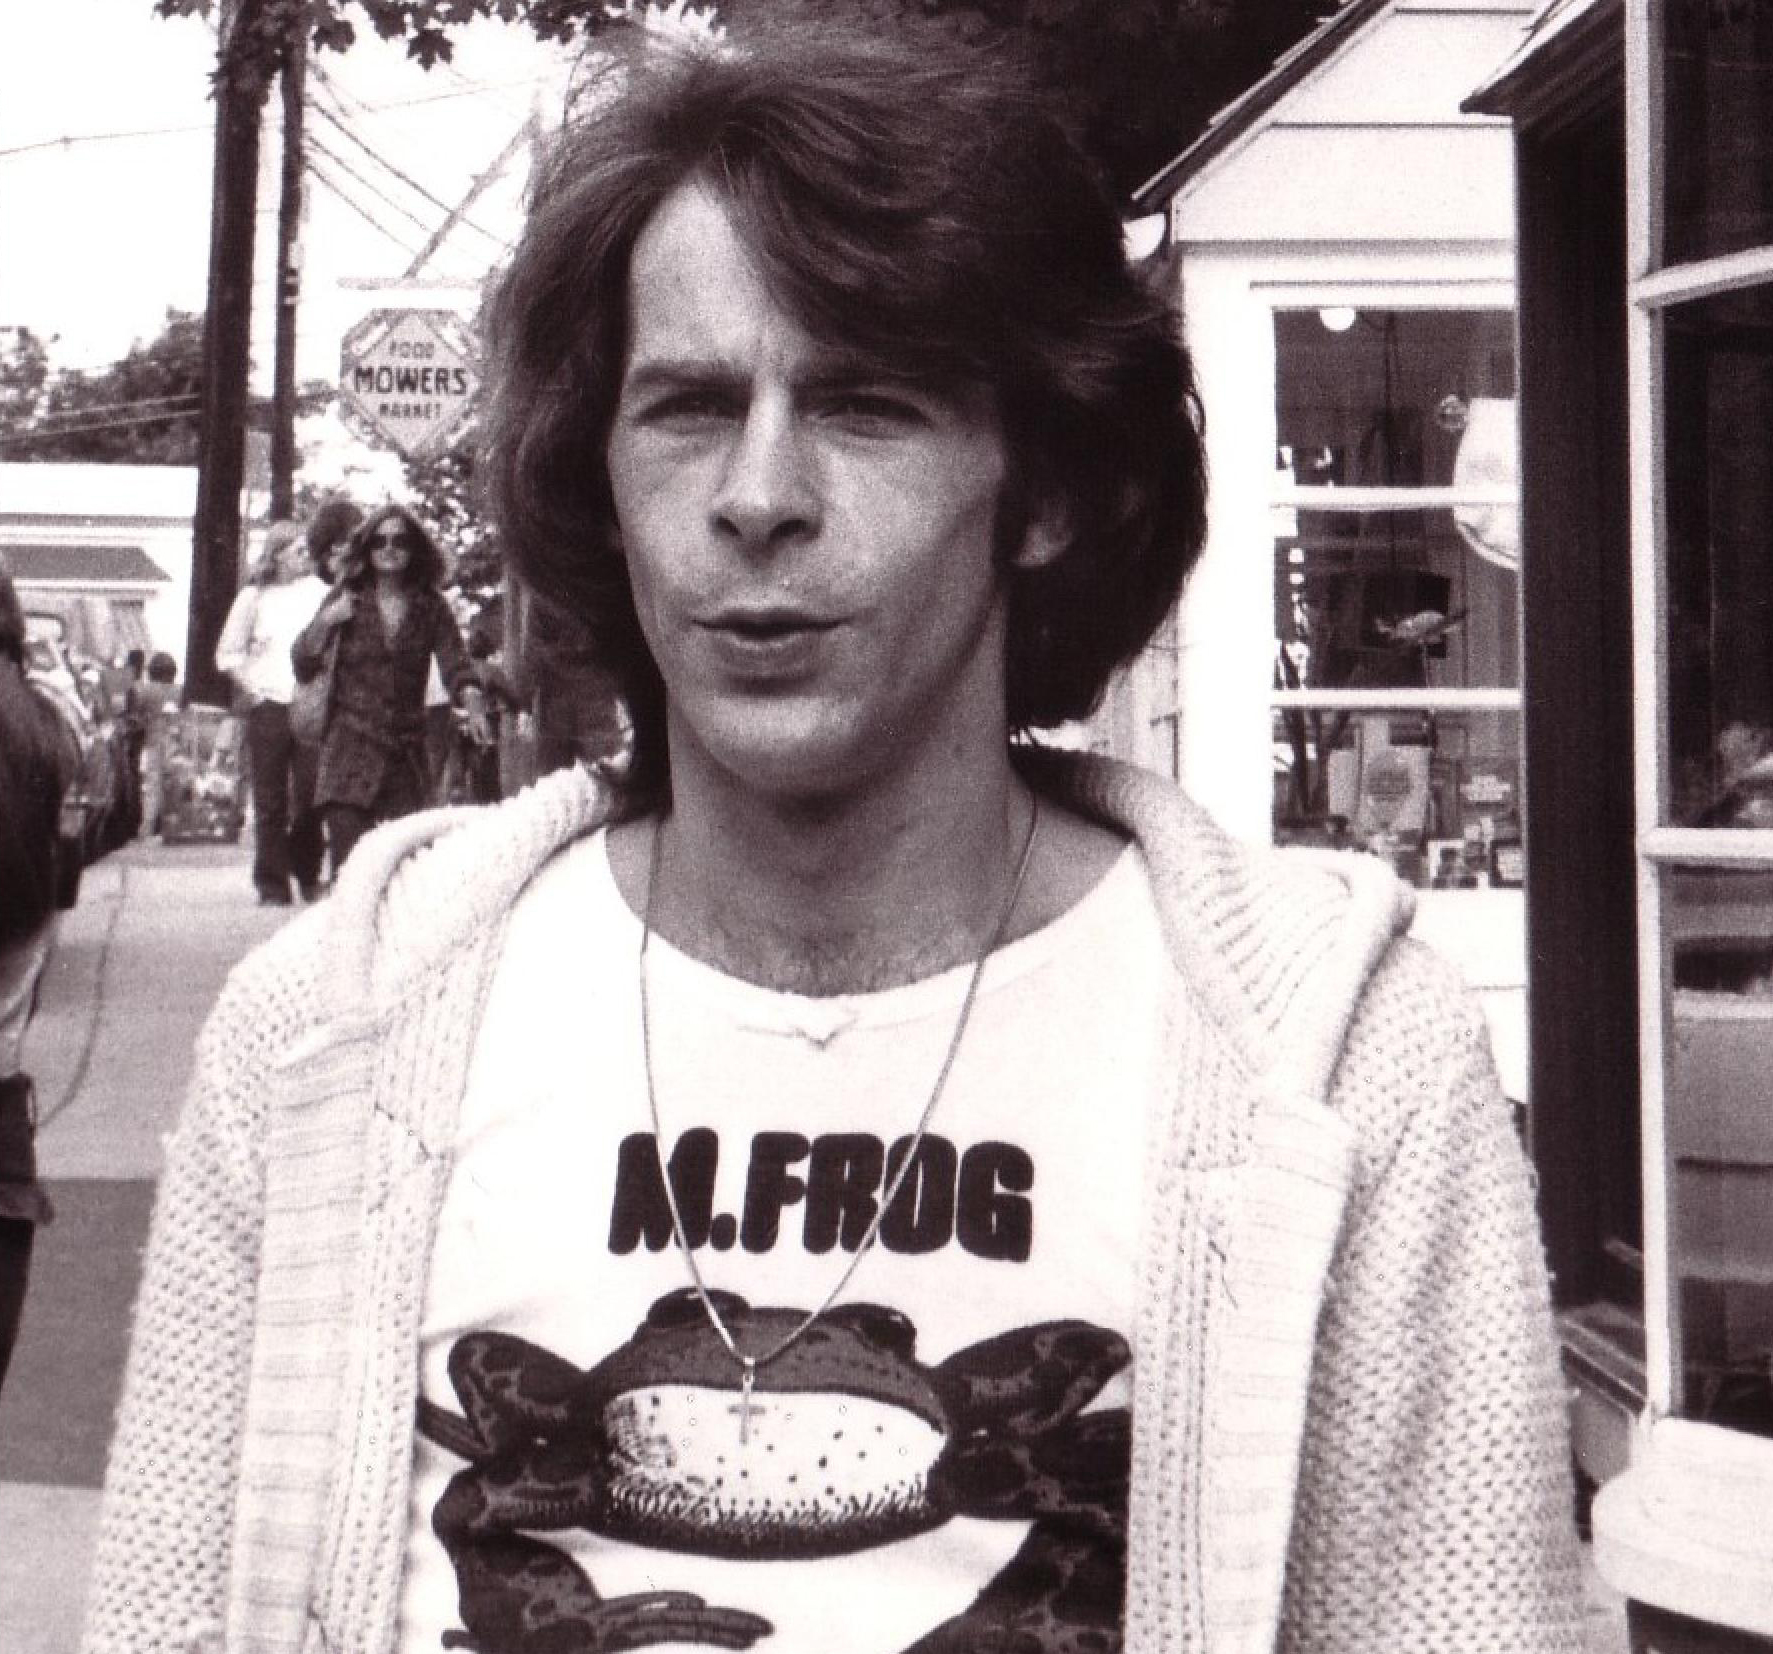 http://gonzai.com/wp-content/uploads/2012/11/M-Frog-Woodstock-Photo-Richard-Gibbs-1974.jpg